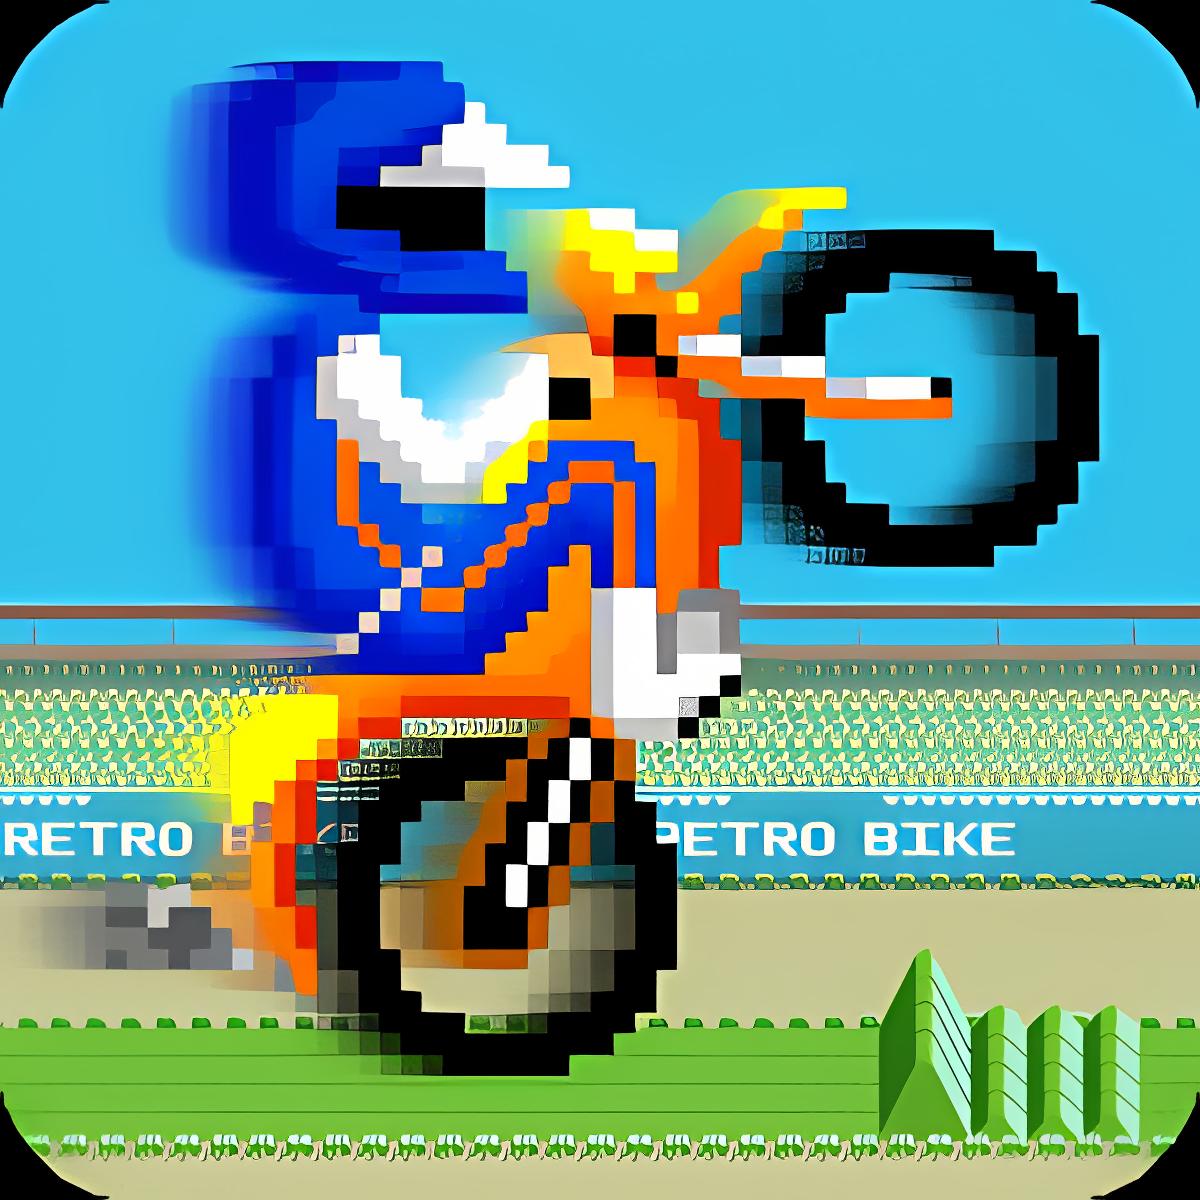 Classic Retro Bike